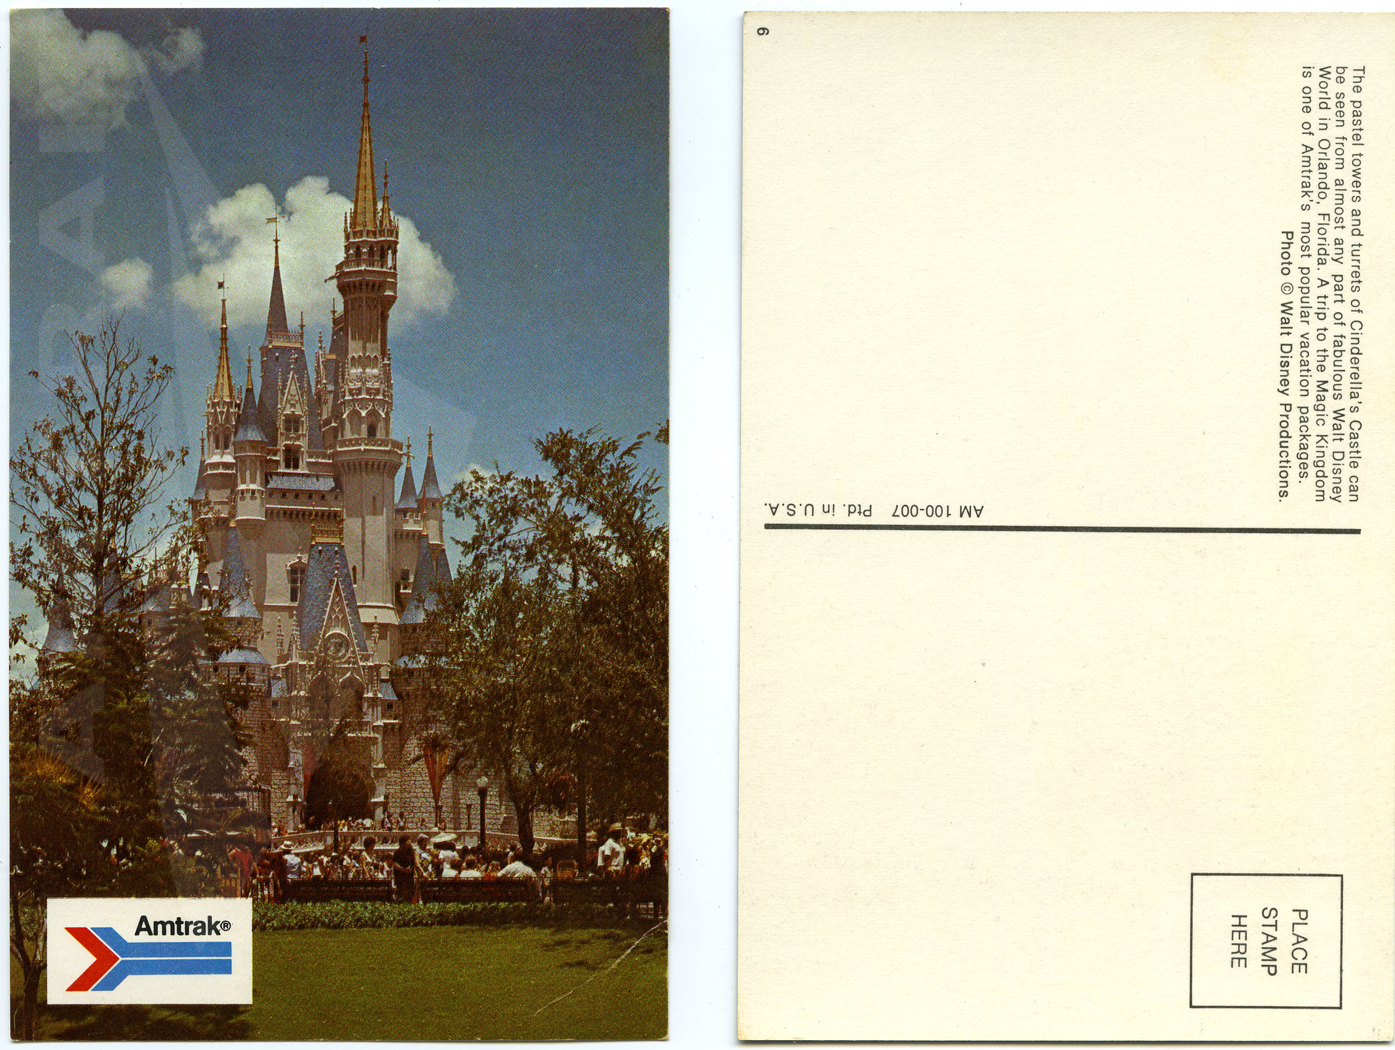 Disney World Postcard 1970s Amtrak History Of America S Railroad